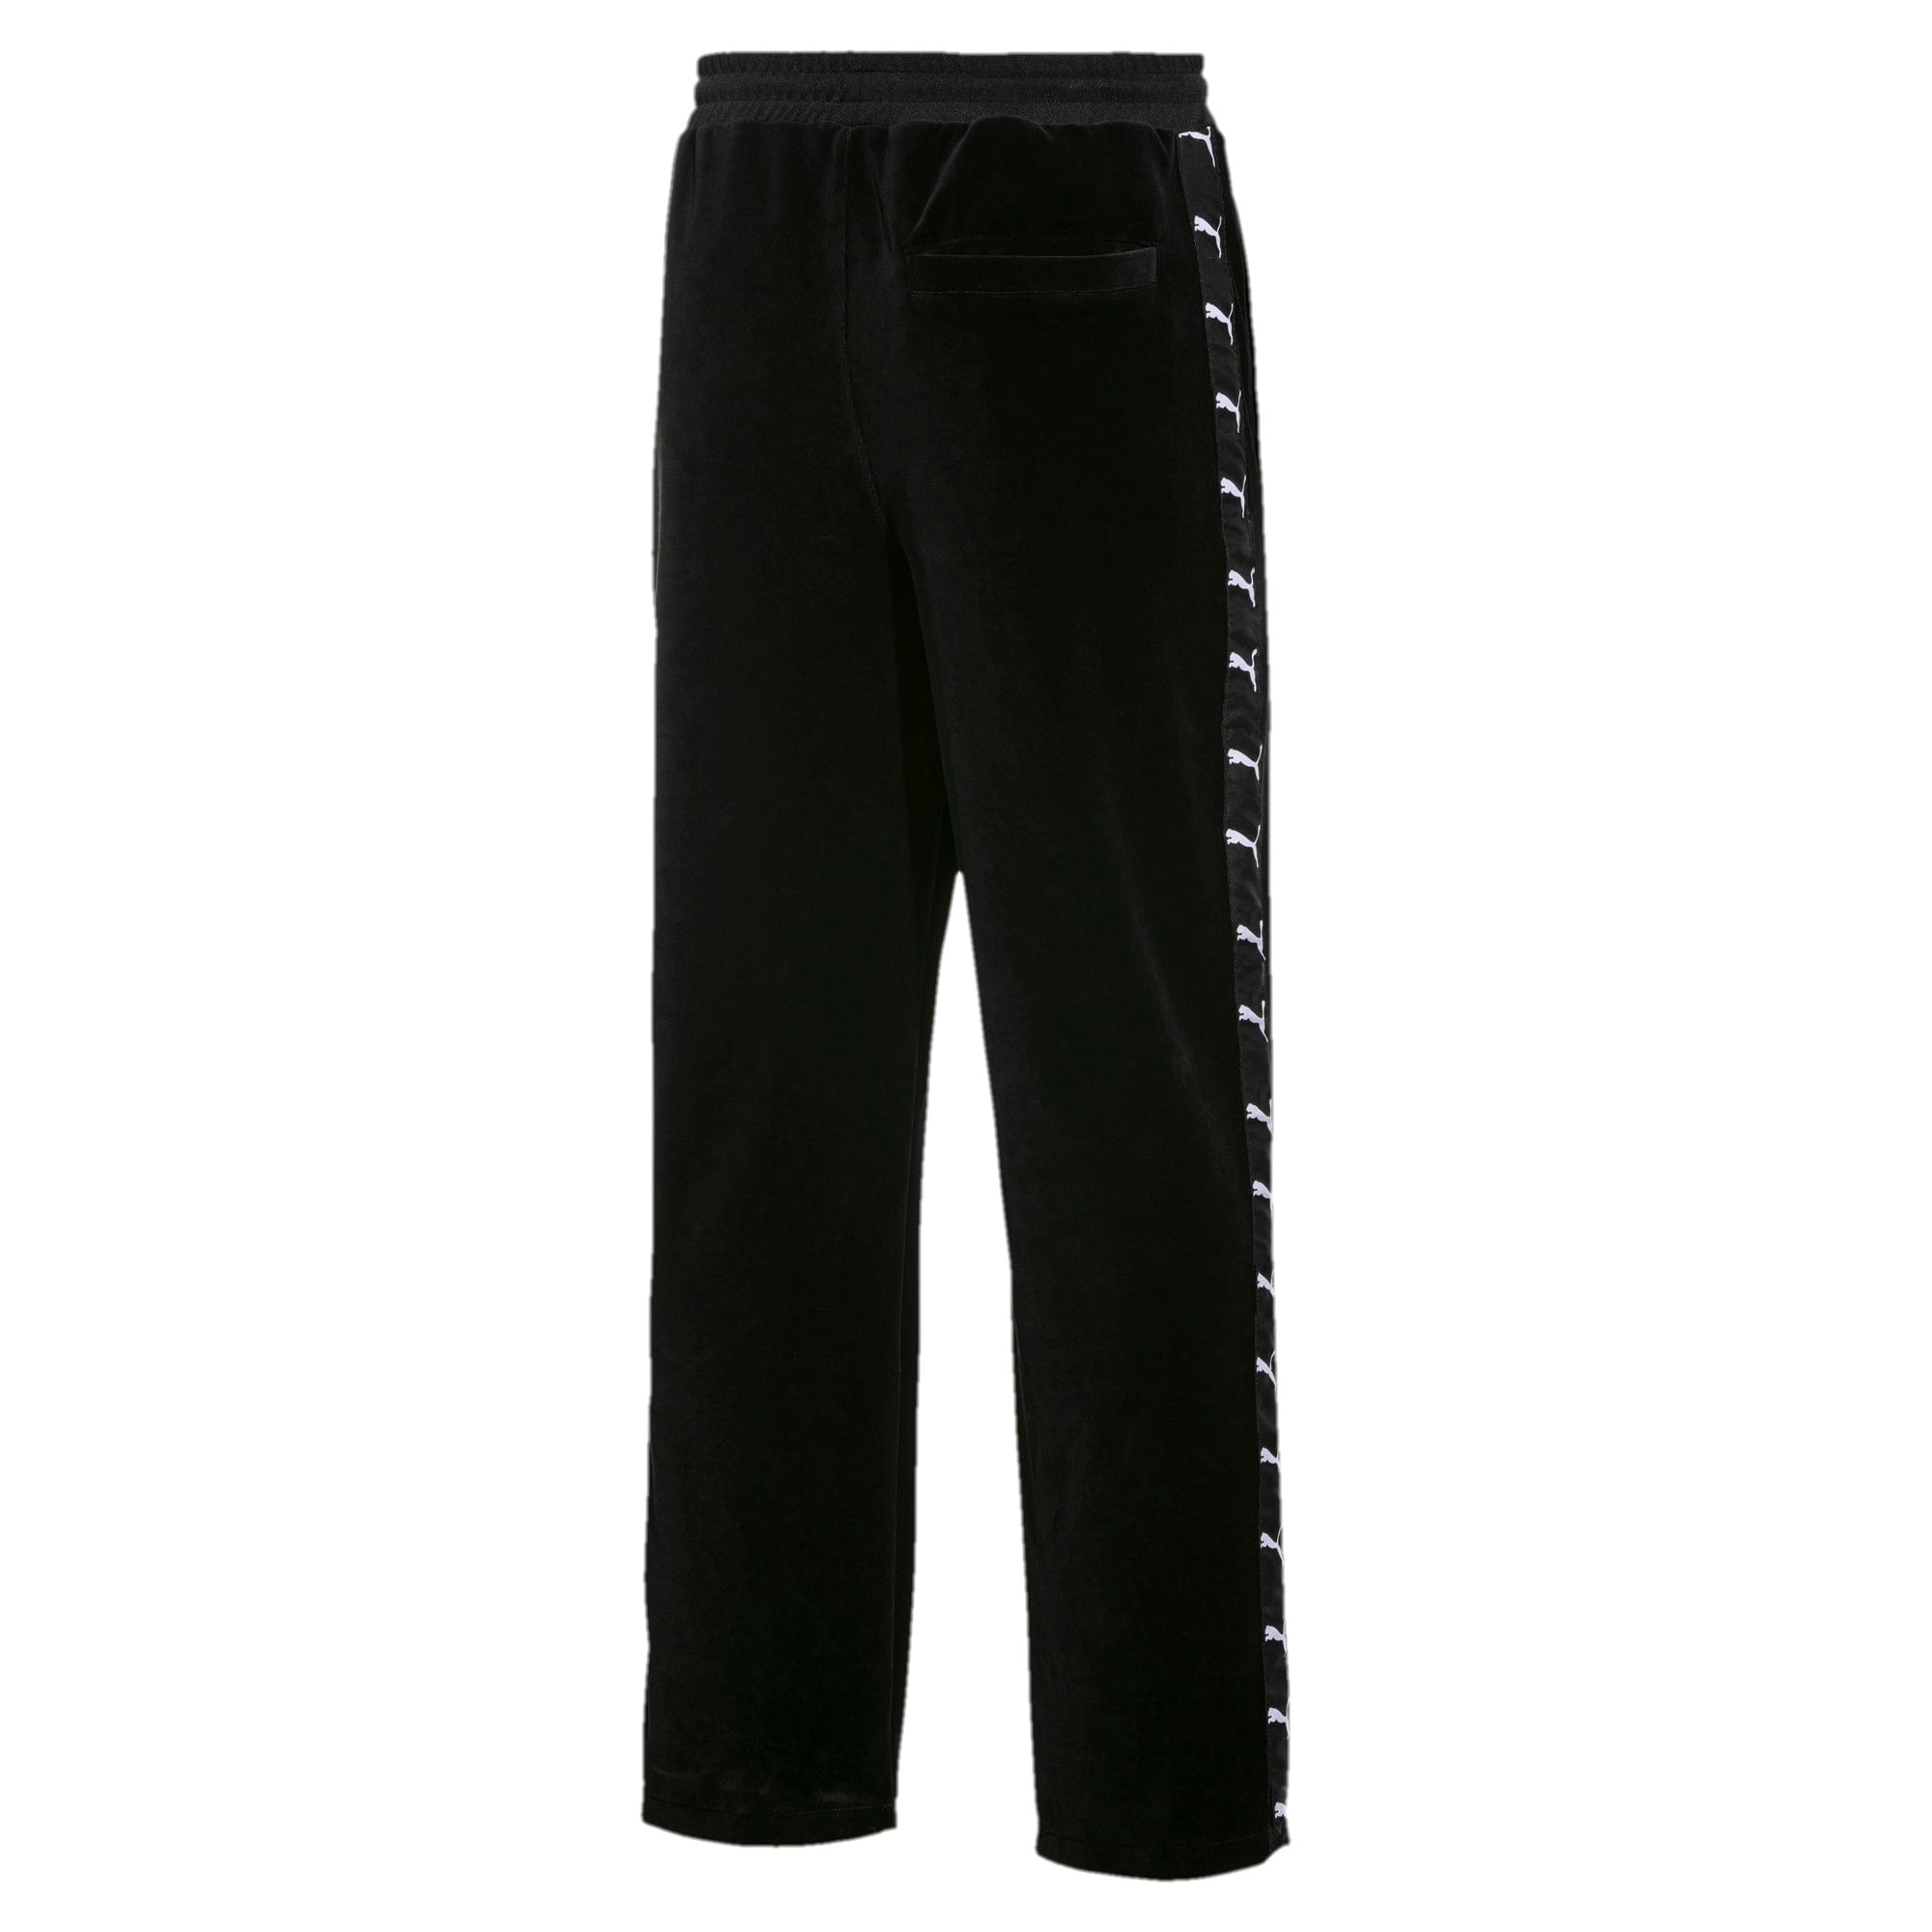 Thumbnail 2 of PUMA x THE KOOPLES Men's Velour Track Pants, Puma Black, medium